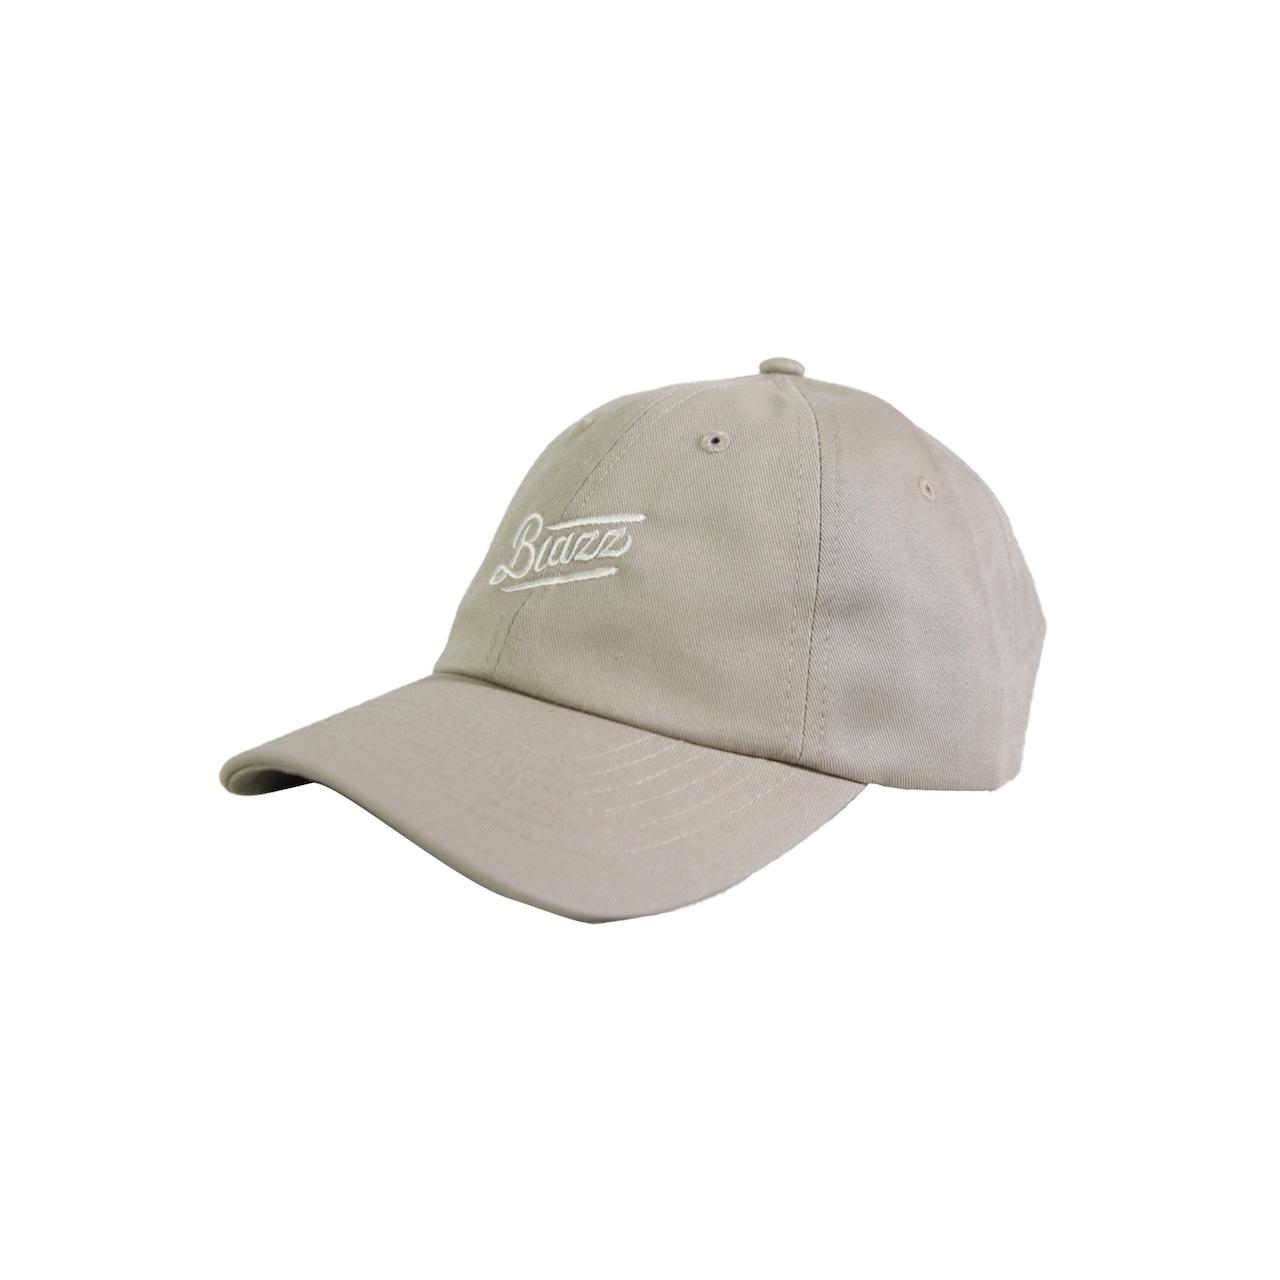 MINI LOGO COTTON CAP [SAND x PALEGOLD]